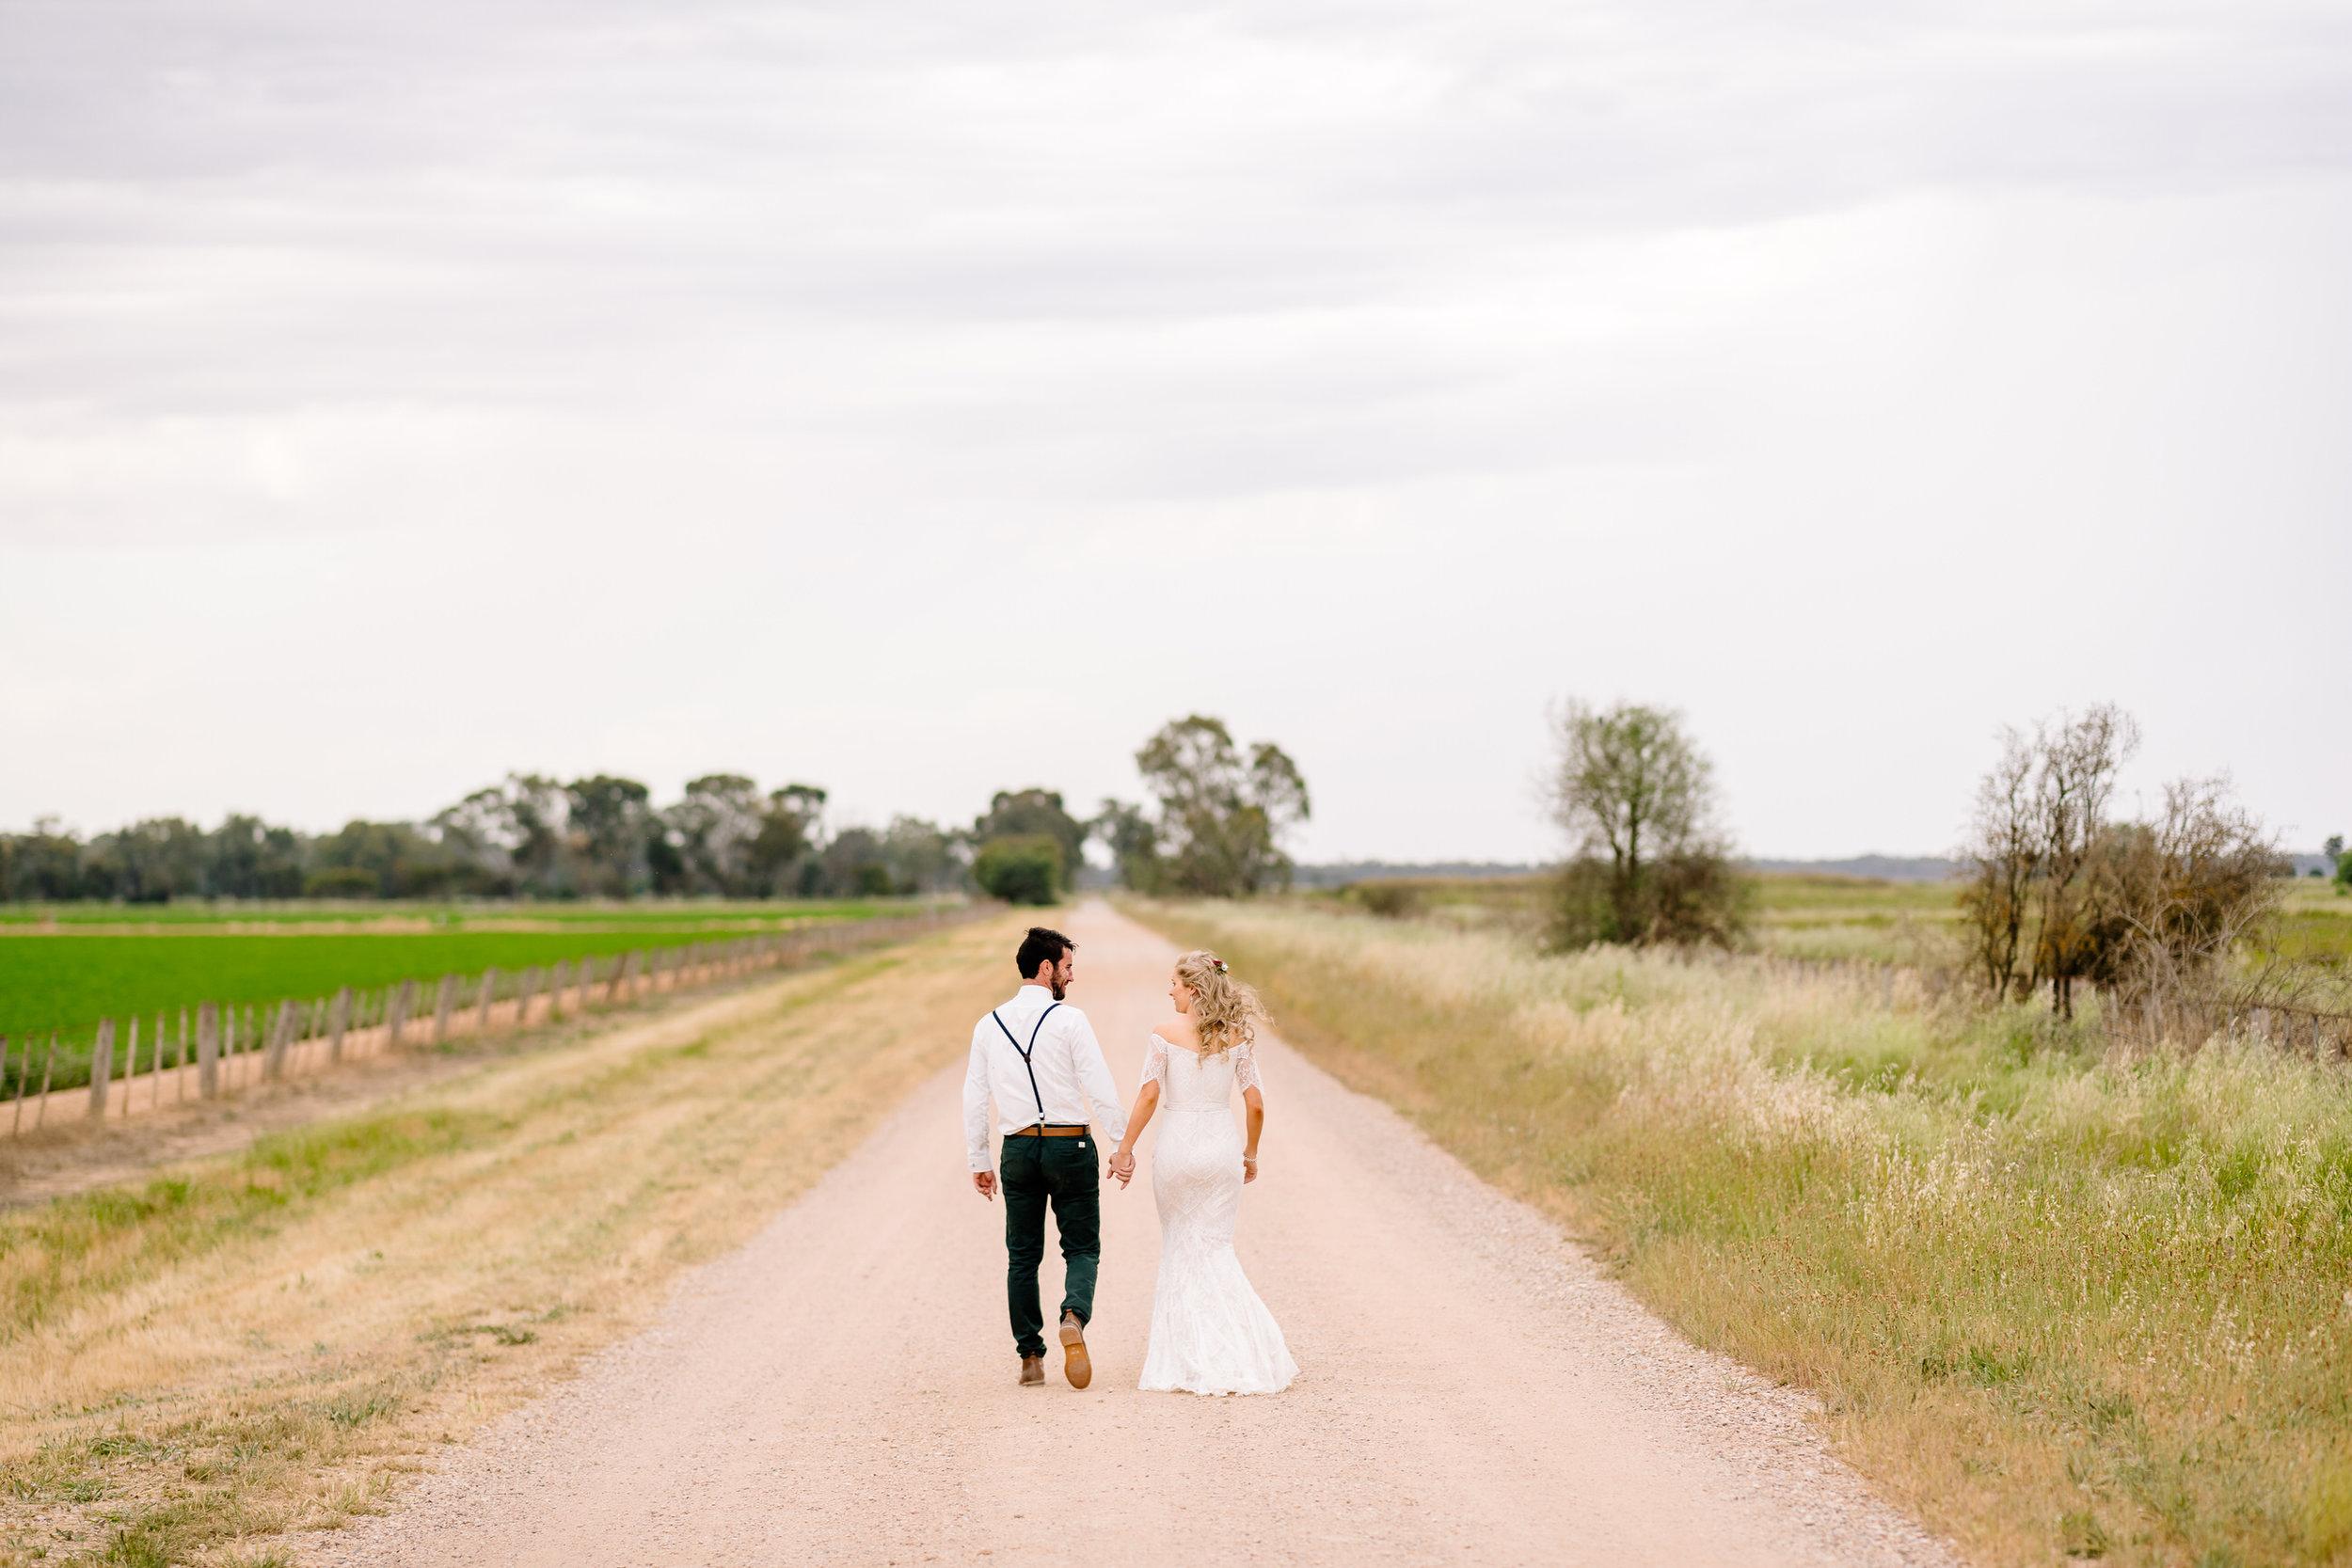 Justin_And_Jim_Photography_Backyard_Wedding190.JPG